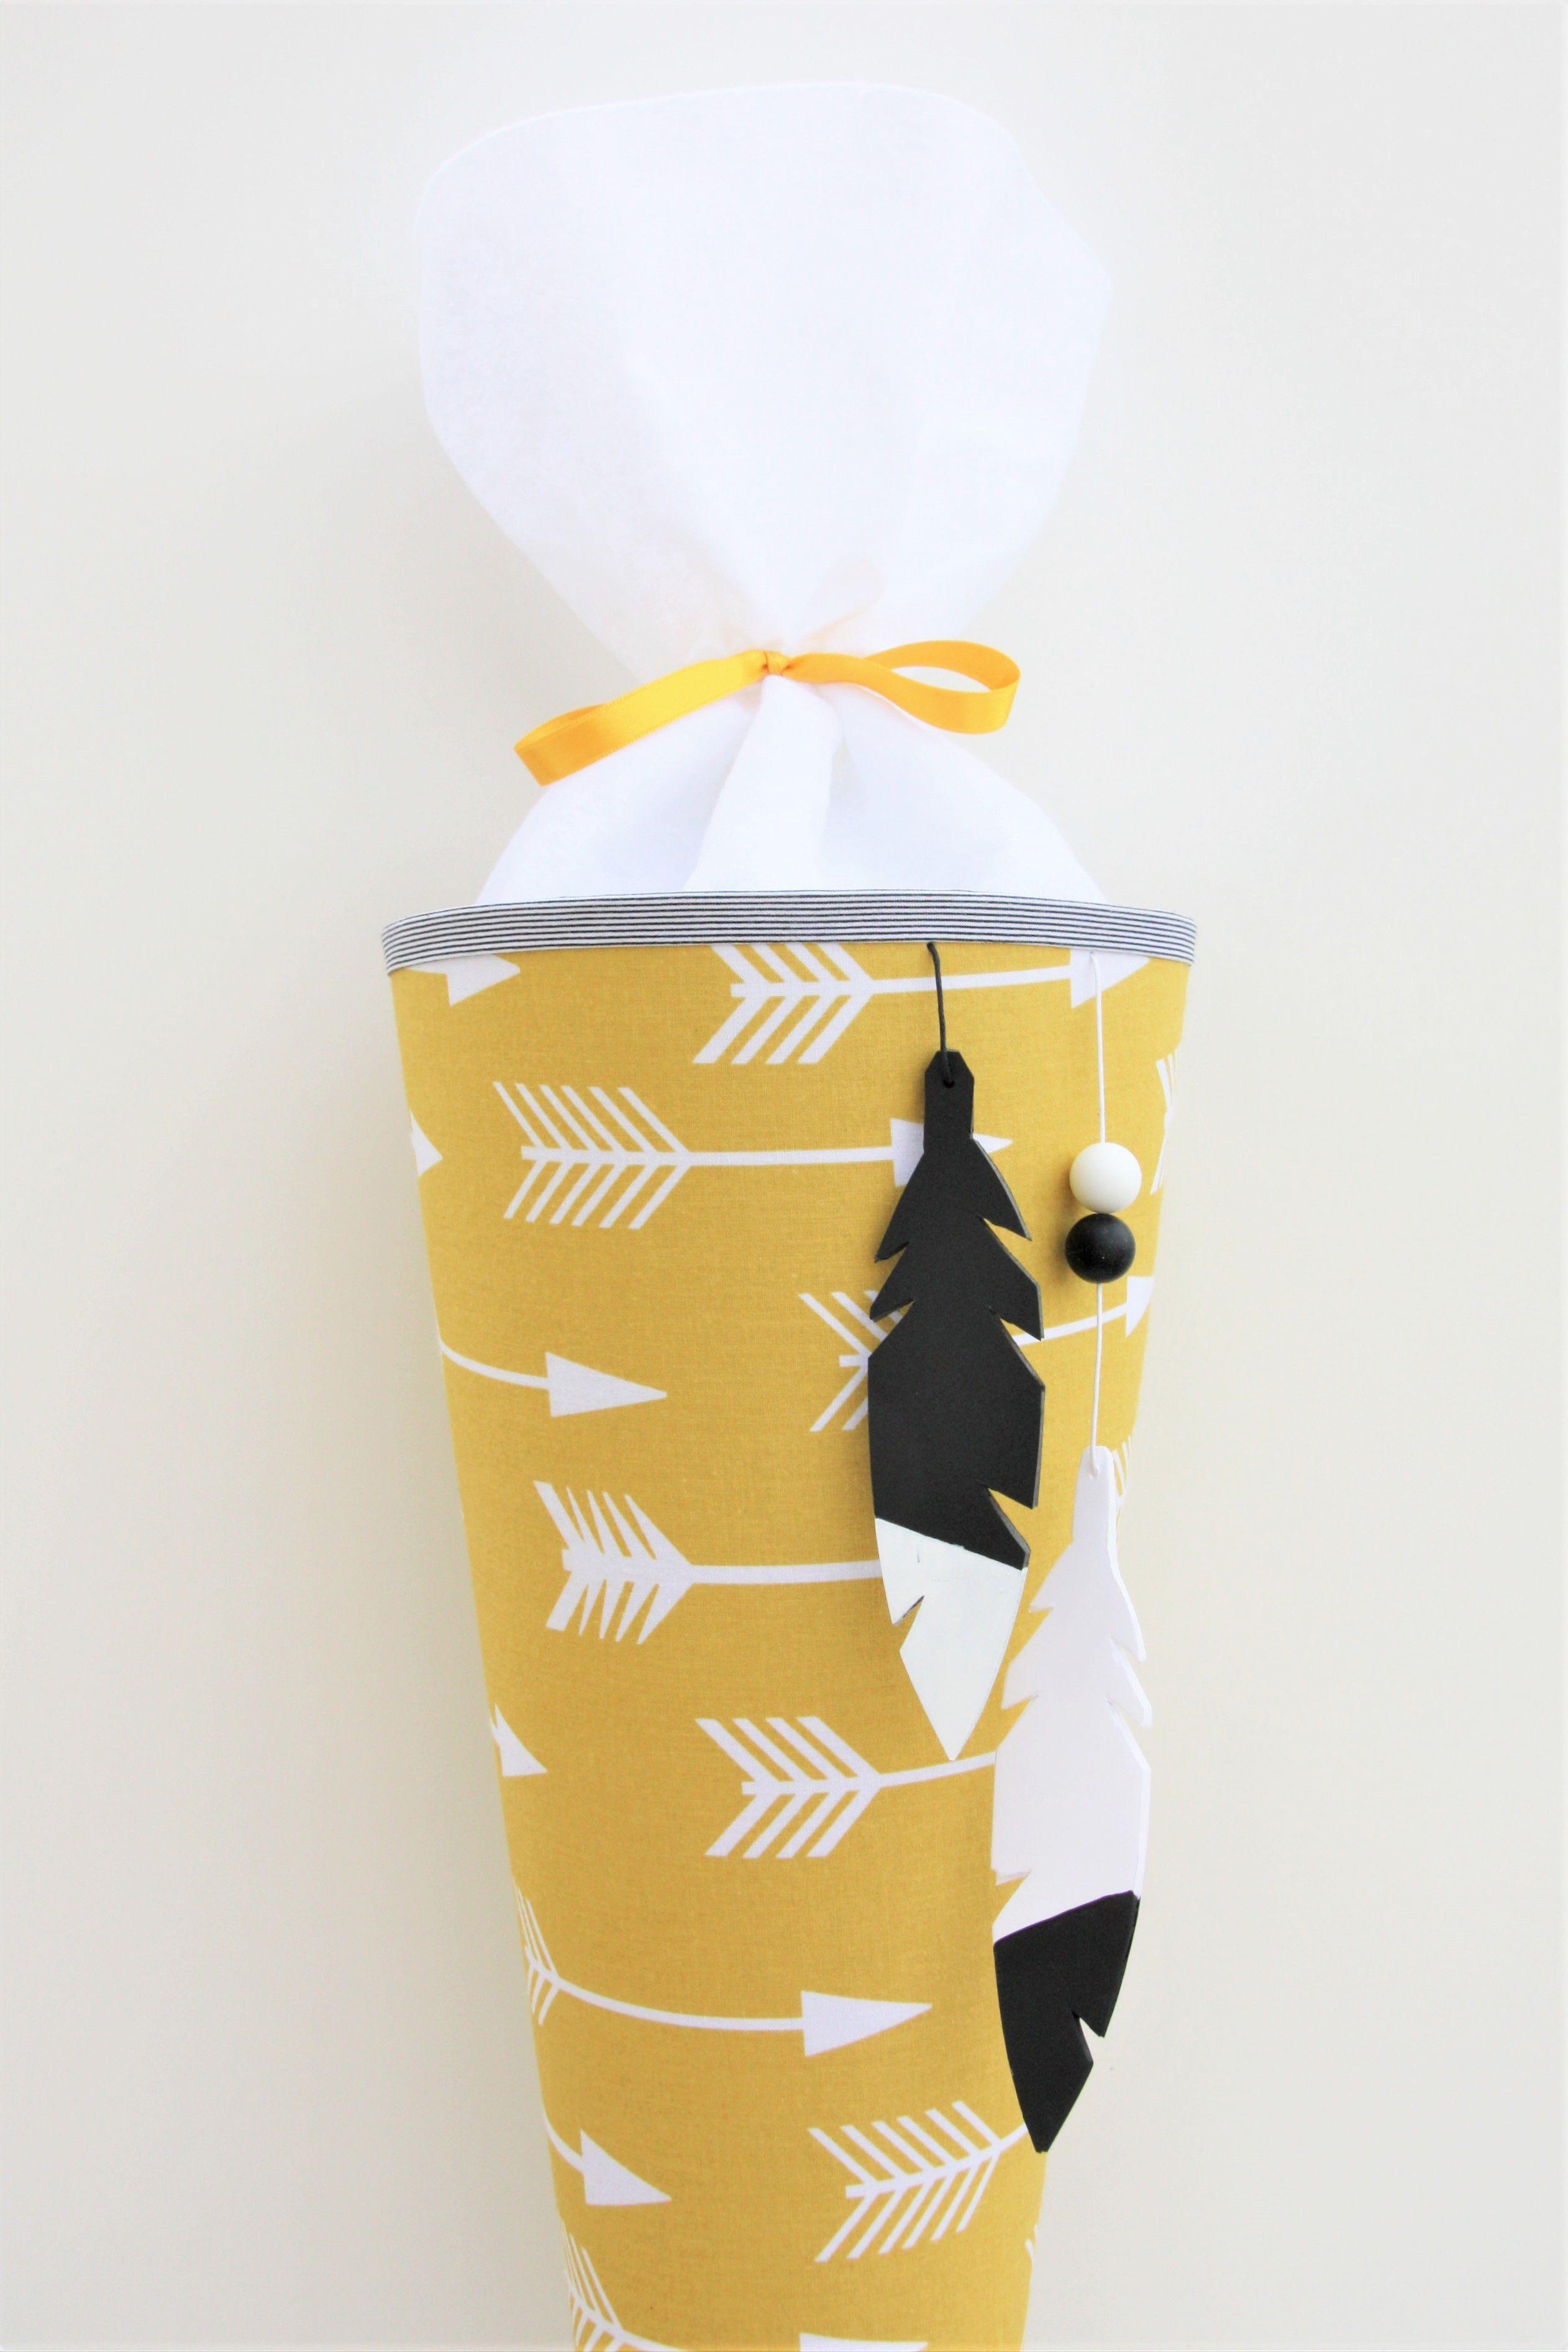 Schultüte 70cm Pferdefreunde Zuckertüte Einschulung Schulanfang